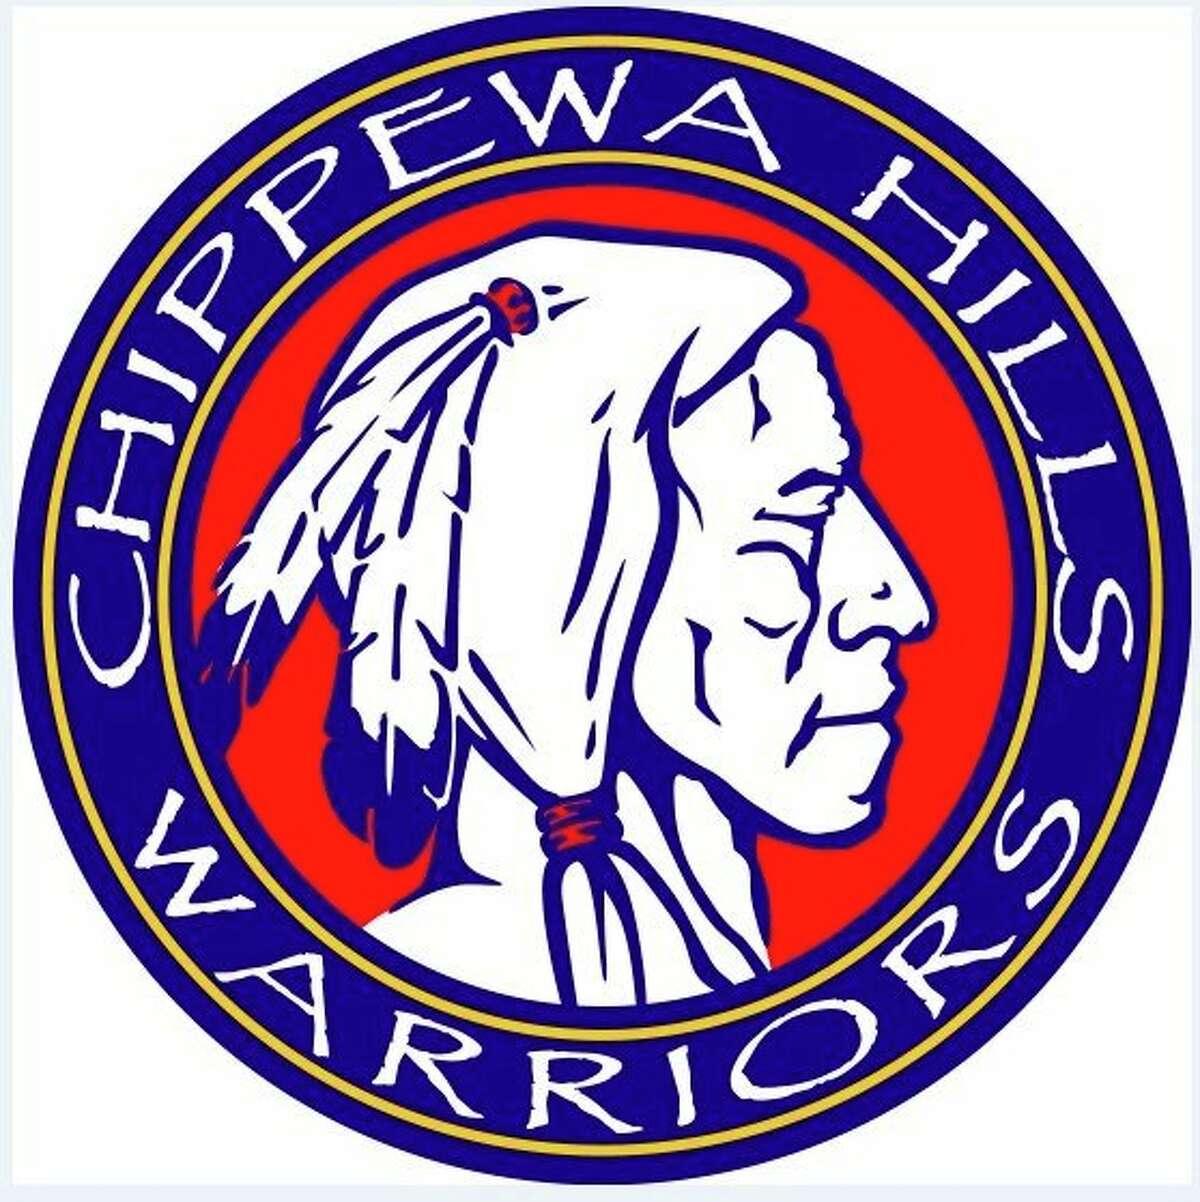 Chippewa Hills School District (Pioneer file photo)